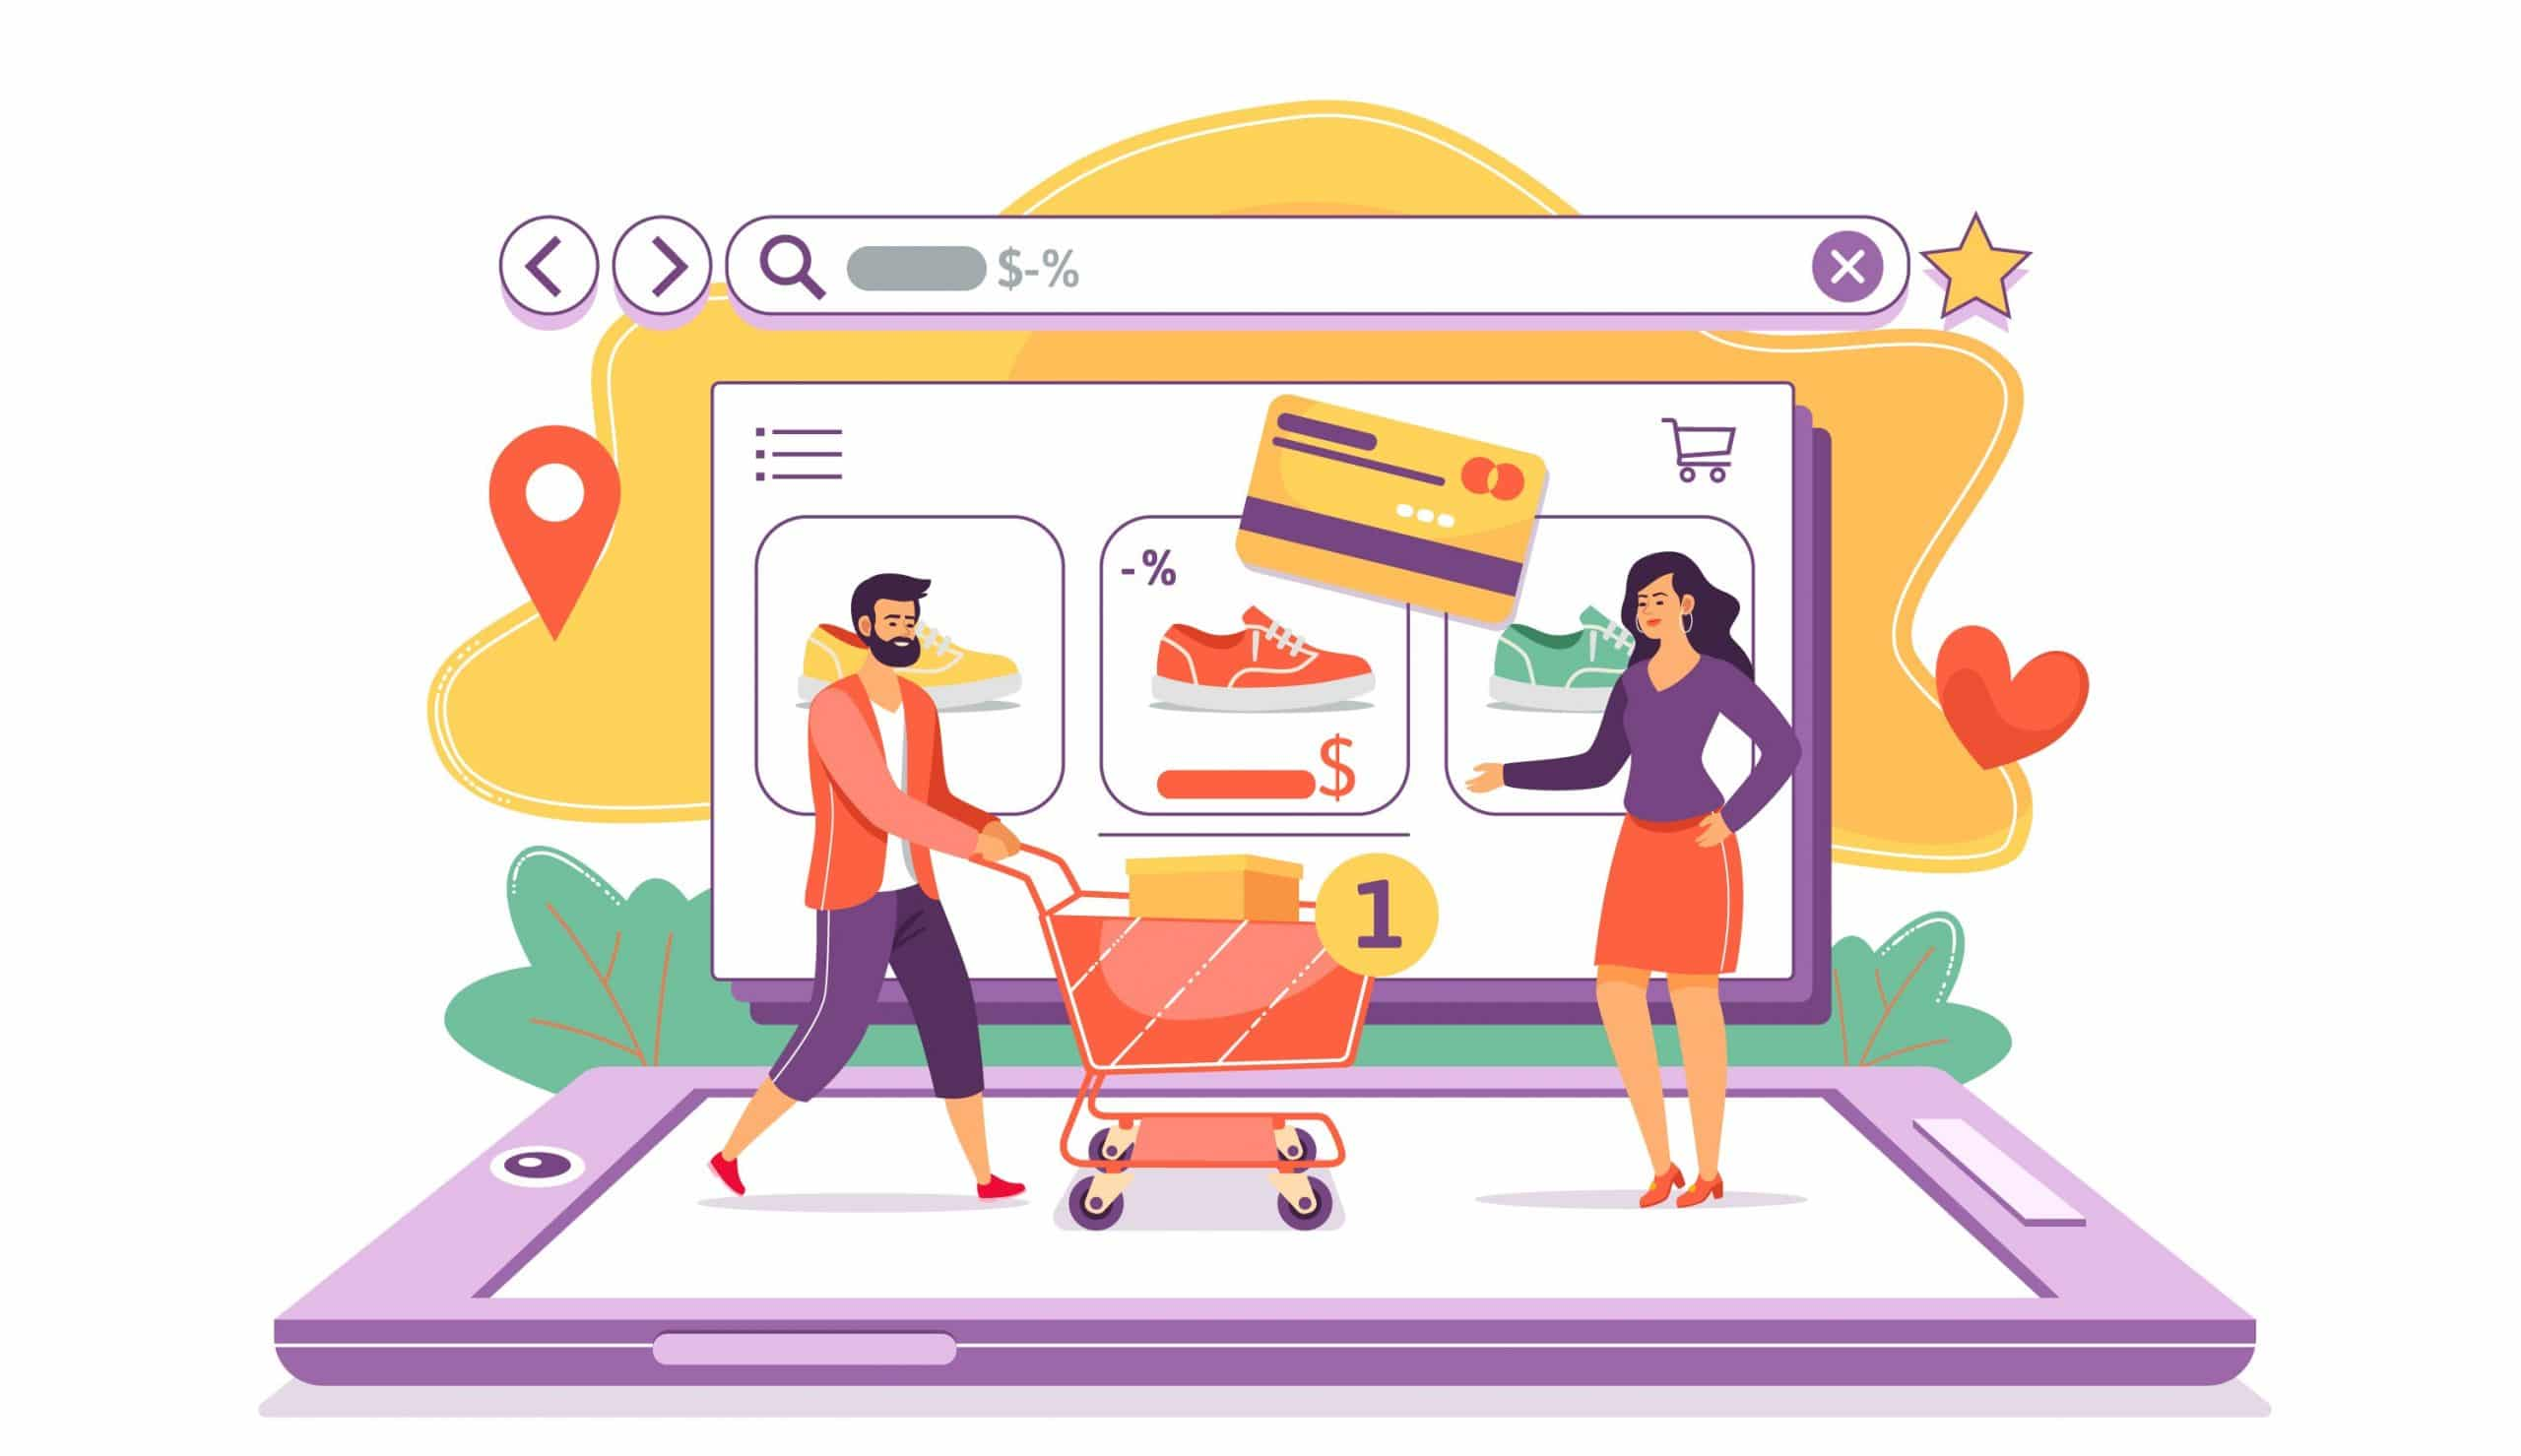 Image de shopping en ligne